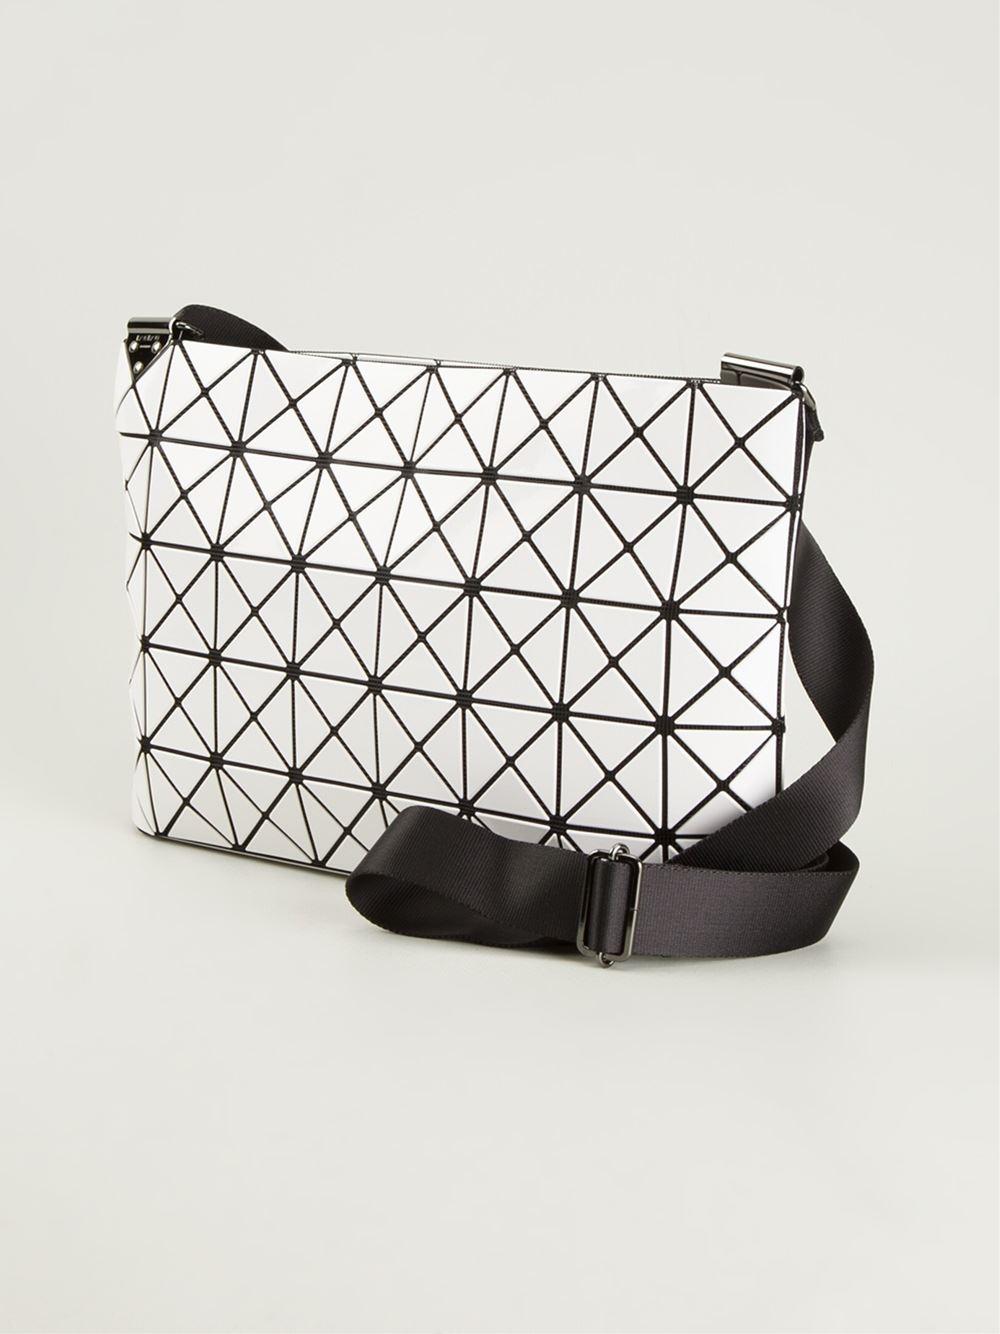 567d1e494db0 Lyst - Bao Bao Issey Miyake Prism Shoulder Bag in White